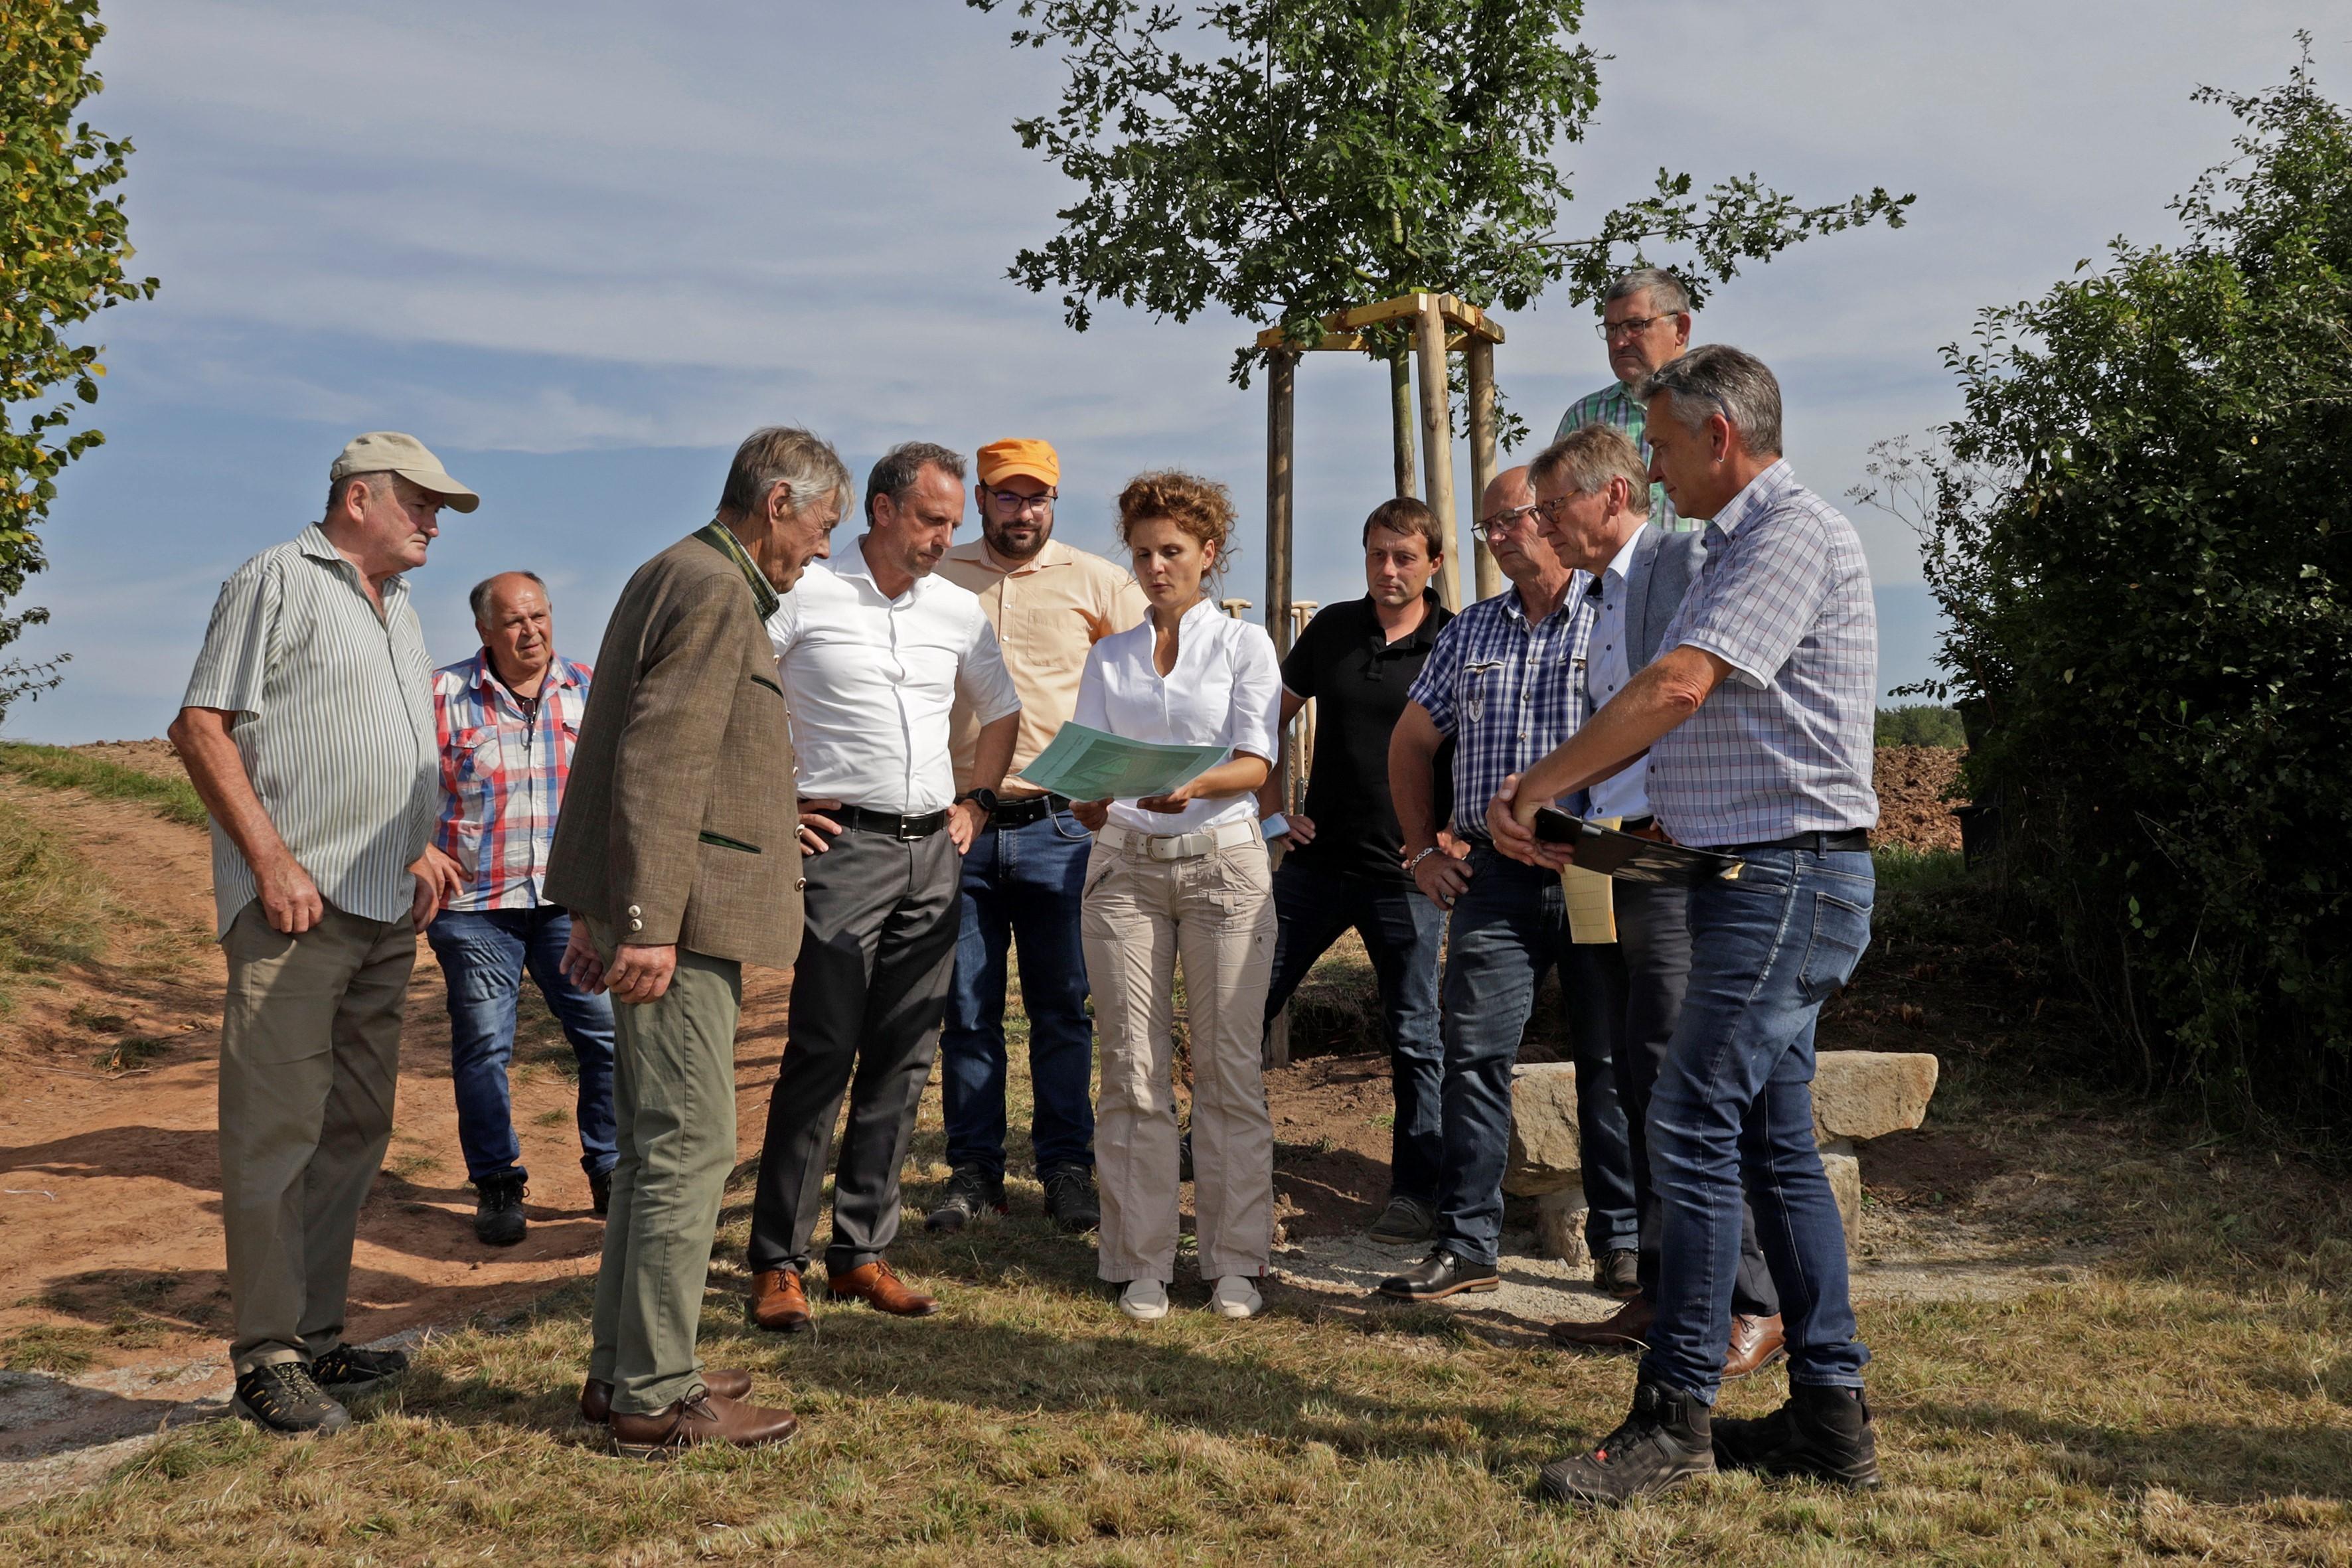 Erste Bürgermeisterin Dorina Jechnerer erklärt die Planungen (Fotos: Günther Holzinger)